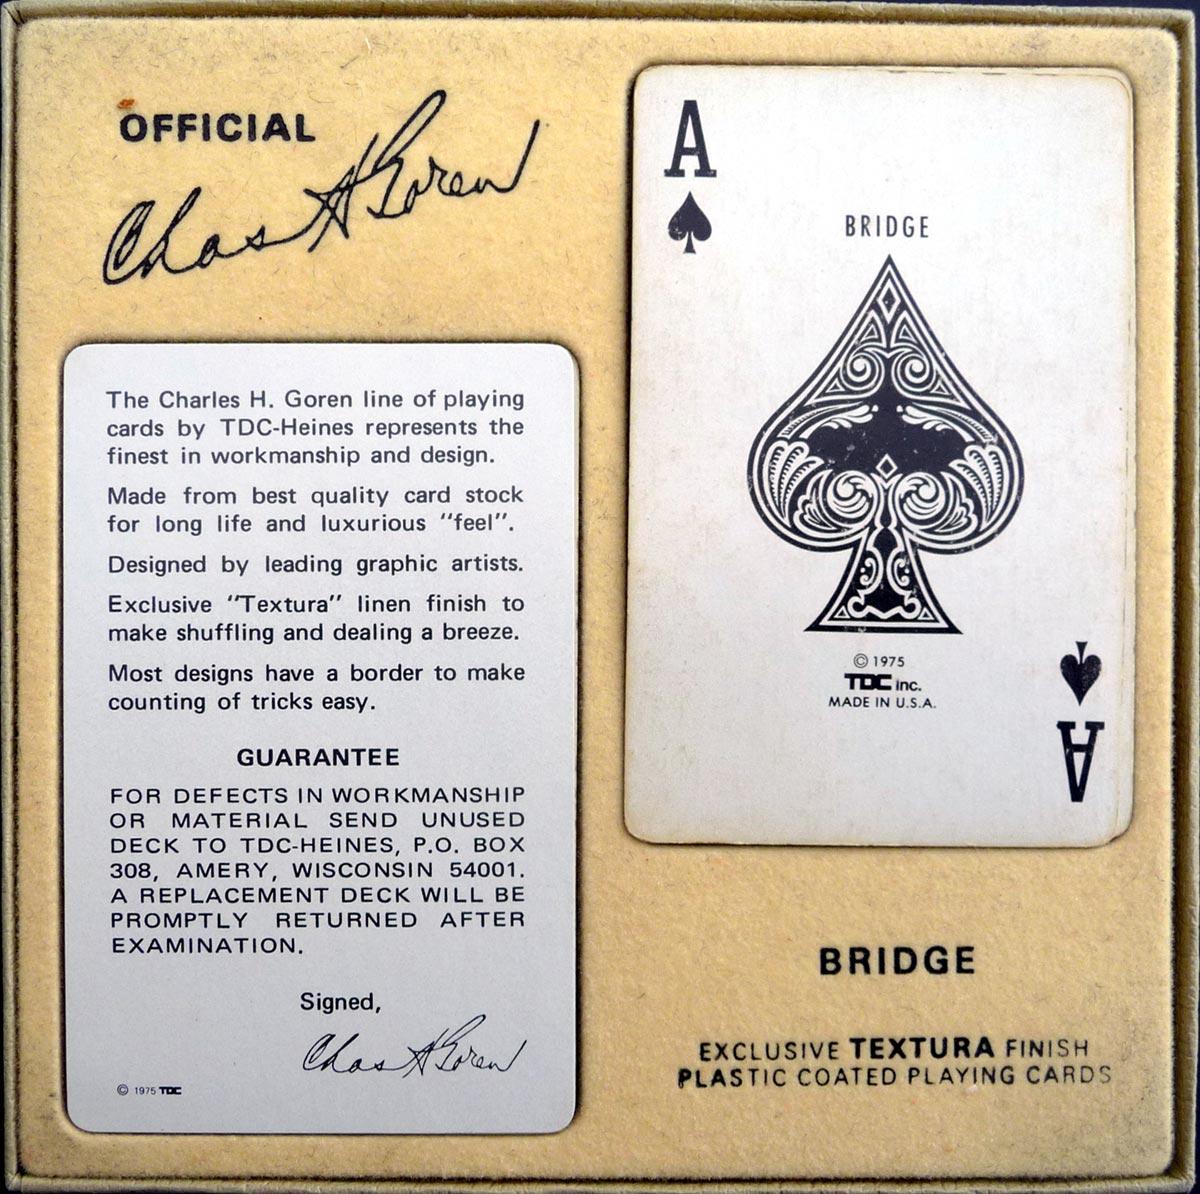 TDC Goren Bridge Cards from the Charles Goren line, 1975